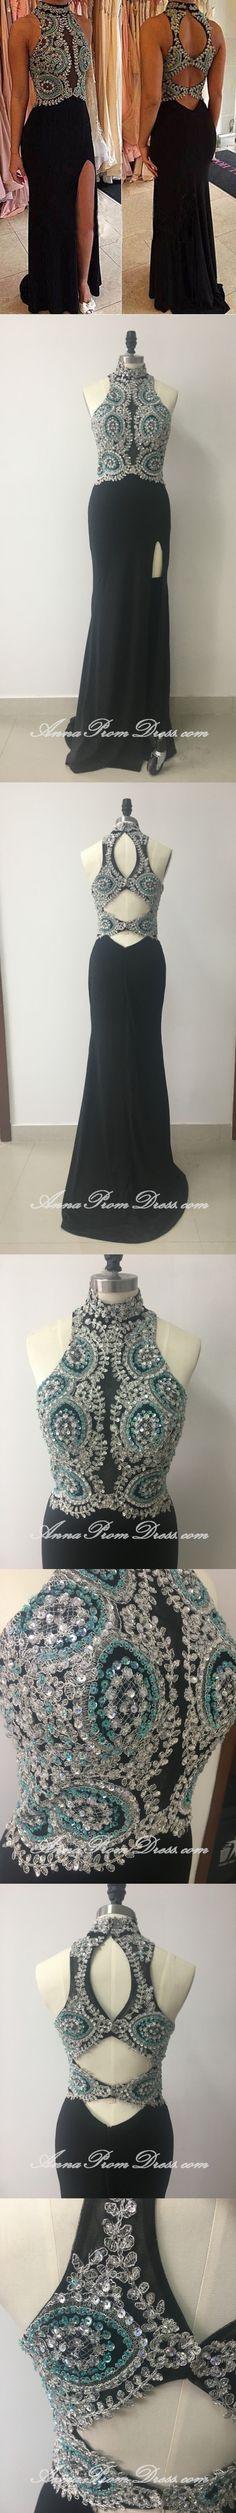 New dress tight short chic ideas Flowy Prom Dresses, Homecoming Dresses Tight, Classy Prom Dresses, Gorgeous Prom Dresses, Simple Prom Dress, Dressy Dresses, Classy Dress, Tight Dresses, Nice Dresses